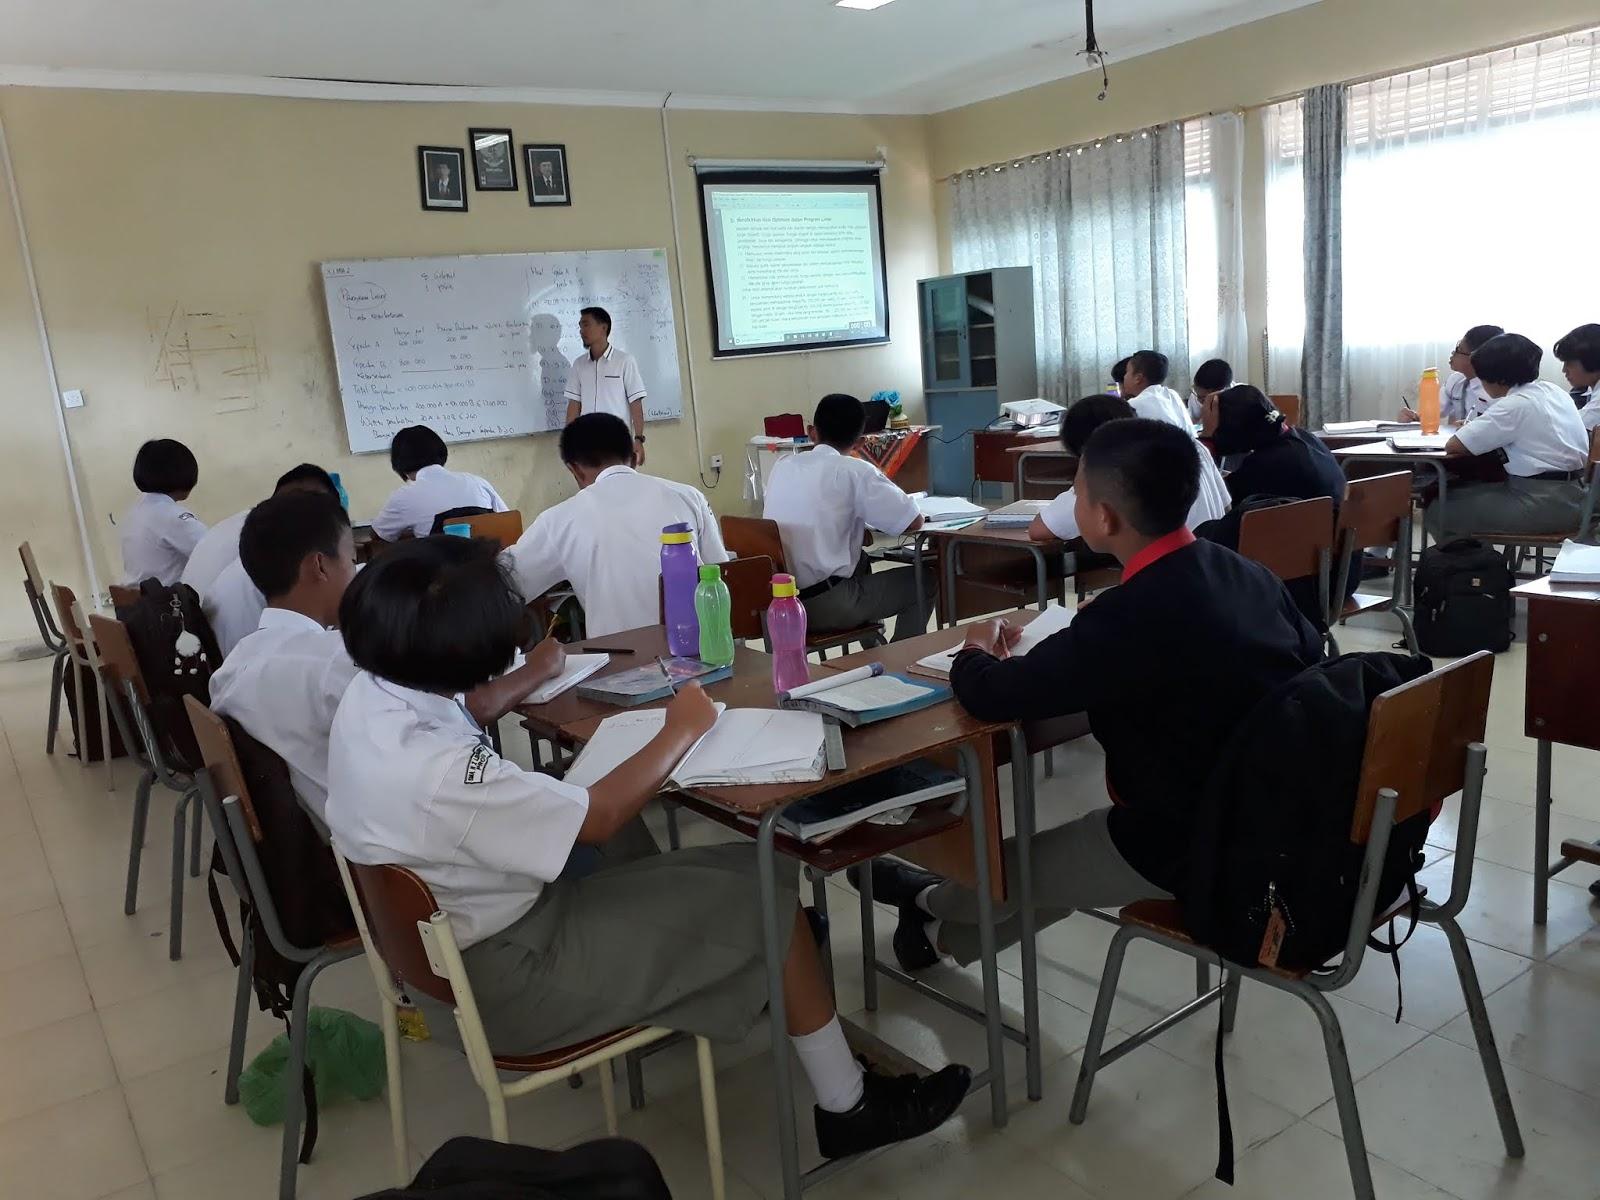 Pengertian Teknik, Taktik dan Model Pembelajaran